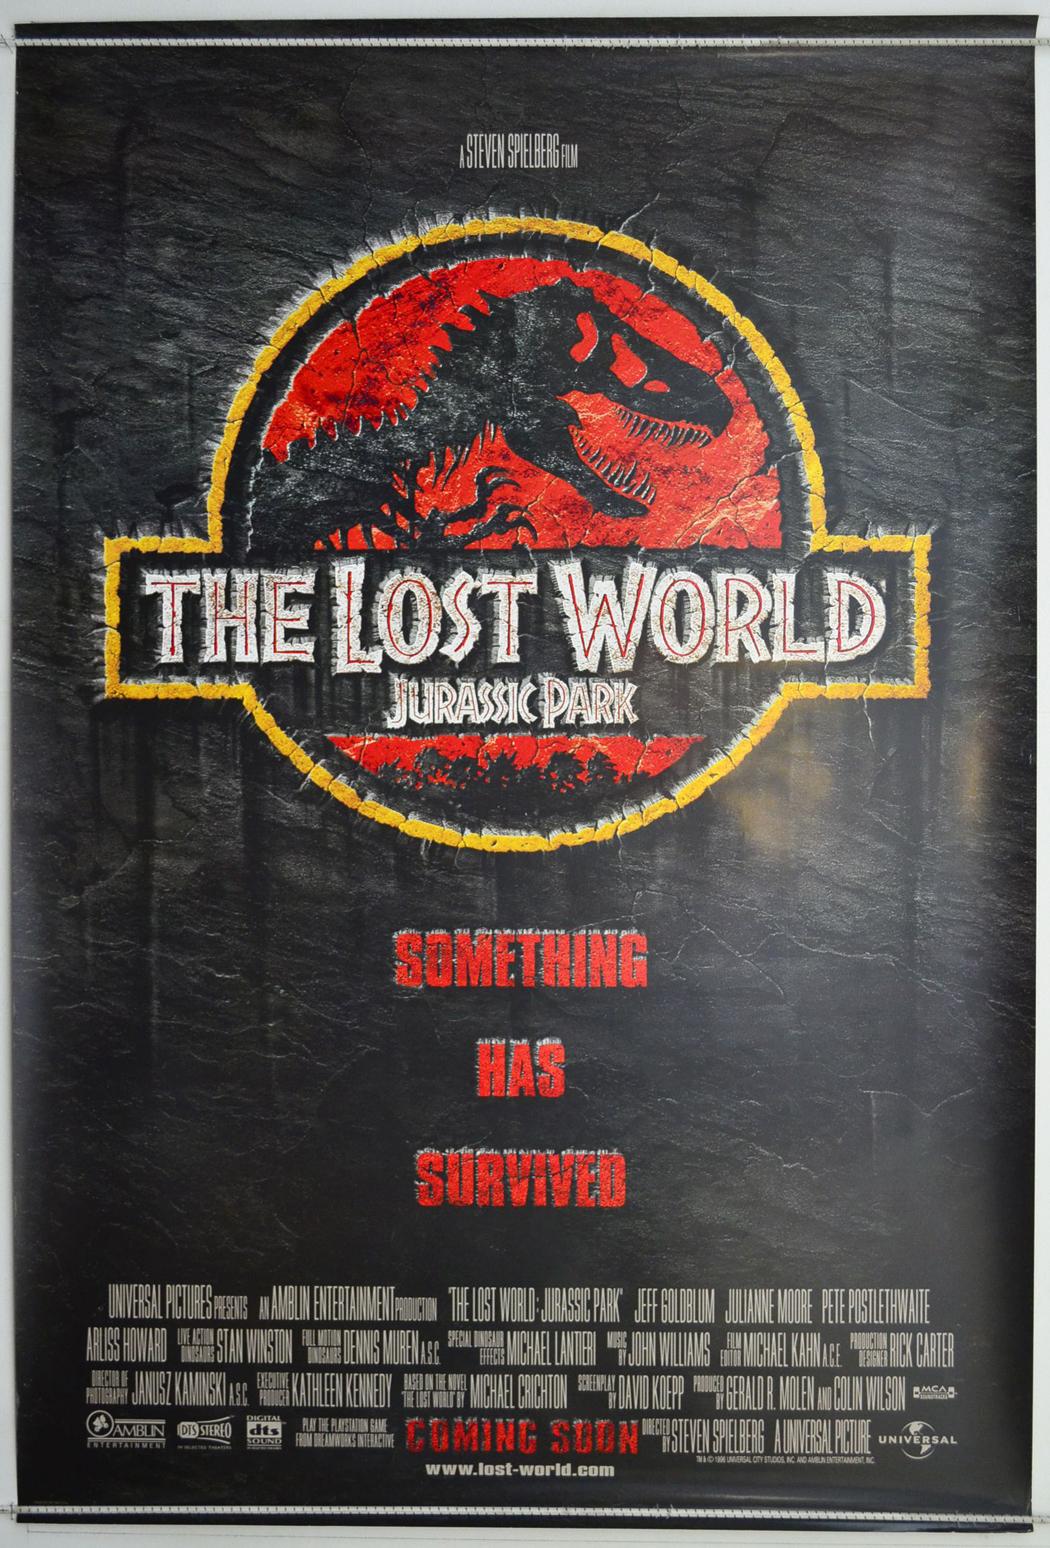 the_lost_world_jurassic_park_poster.jpg